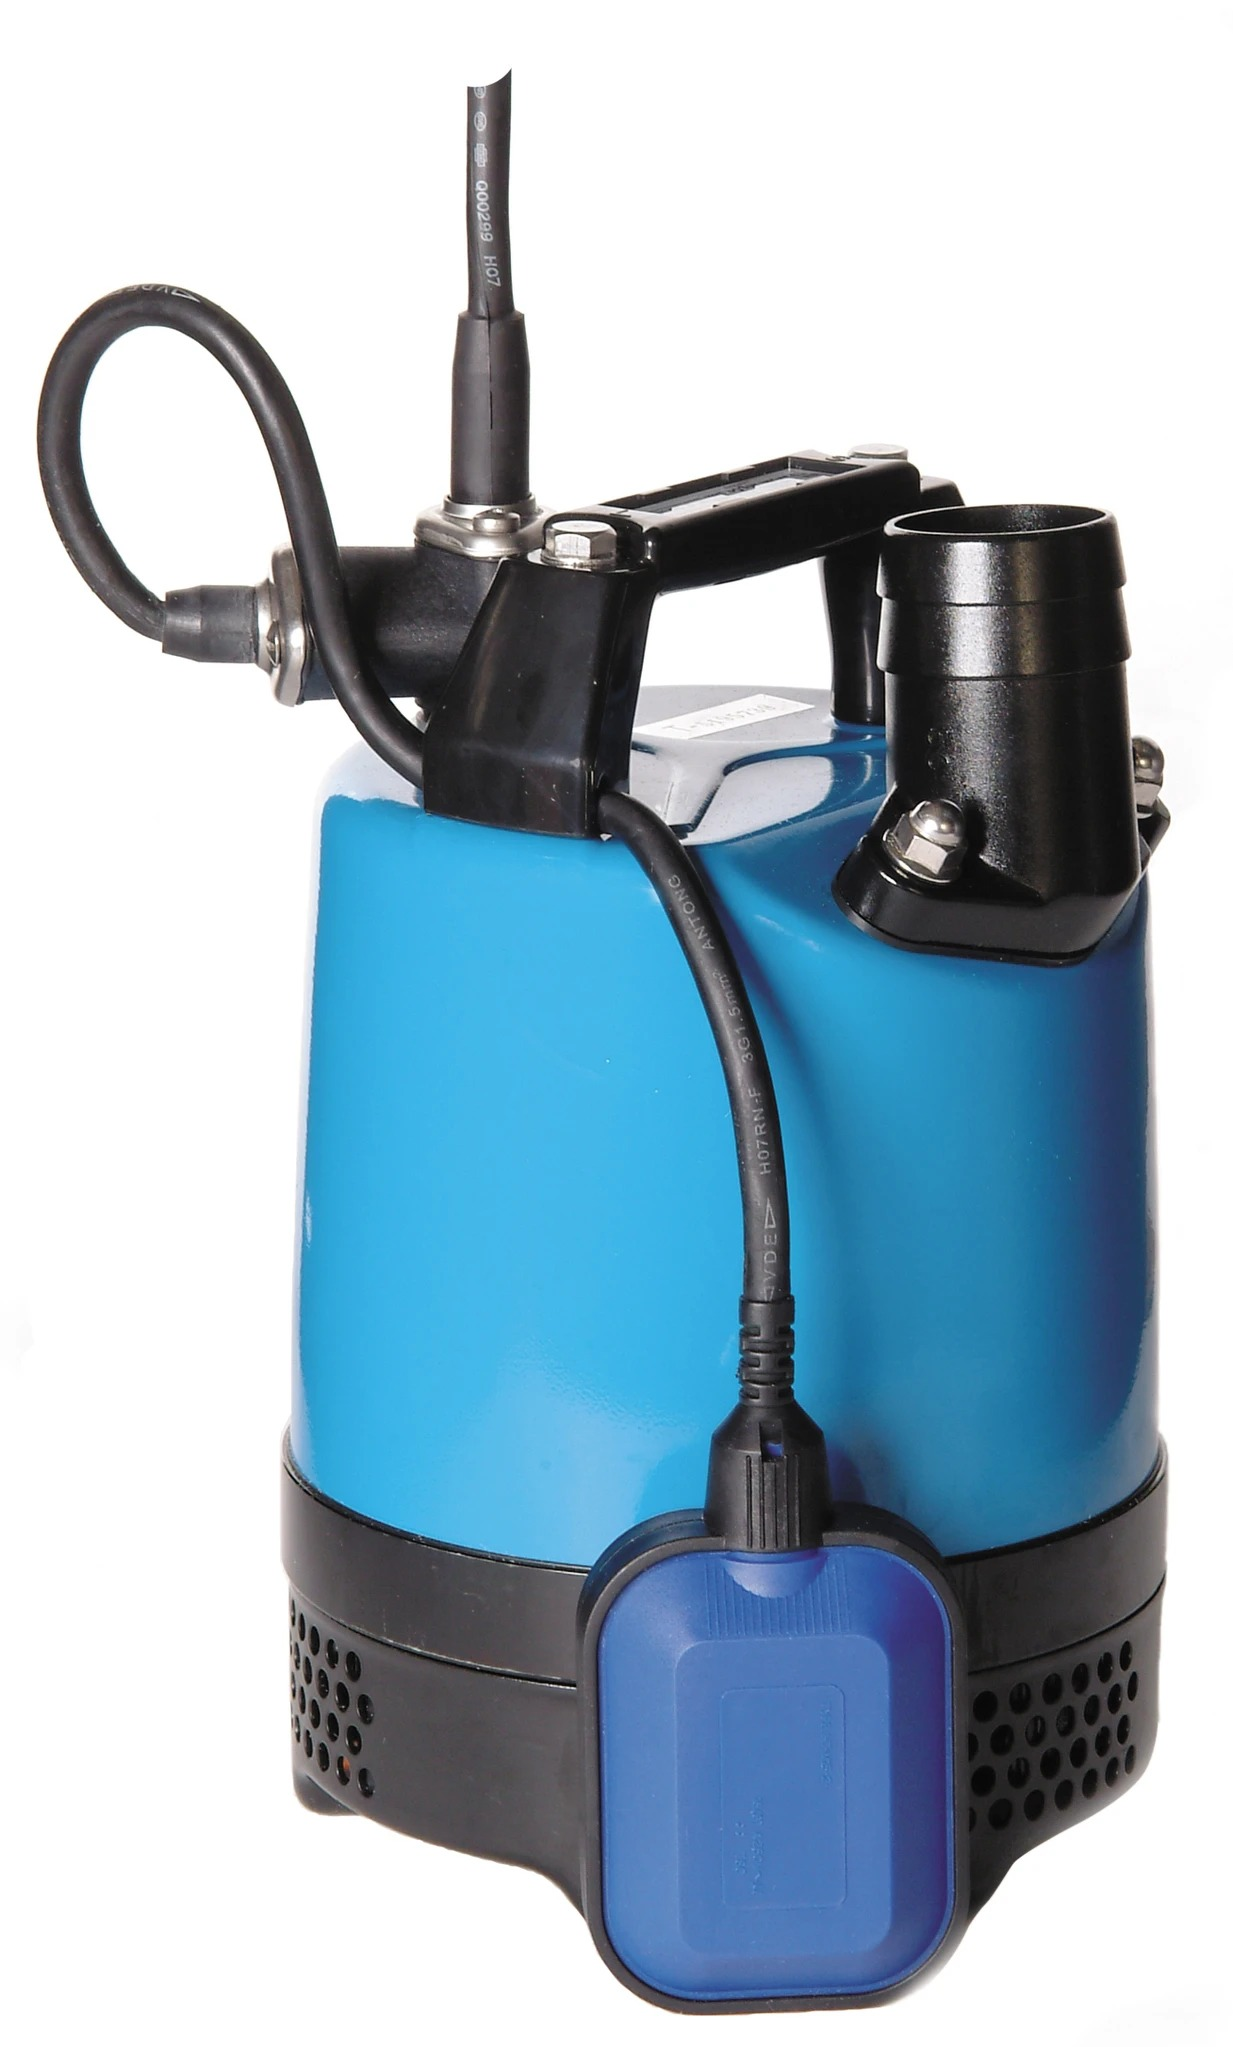 Tsurumi LB480 Auto 50mm Submersible Water Pump 110v 10.8Kg